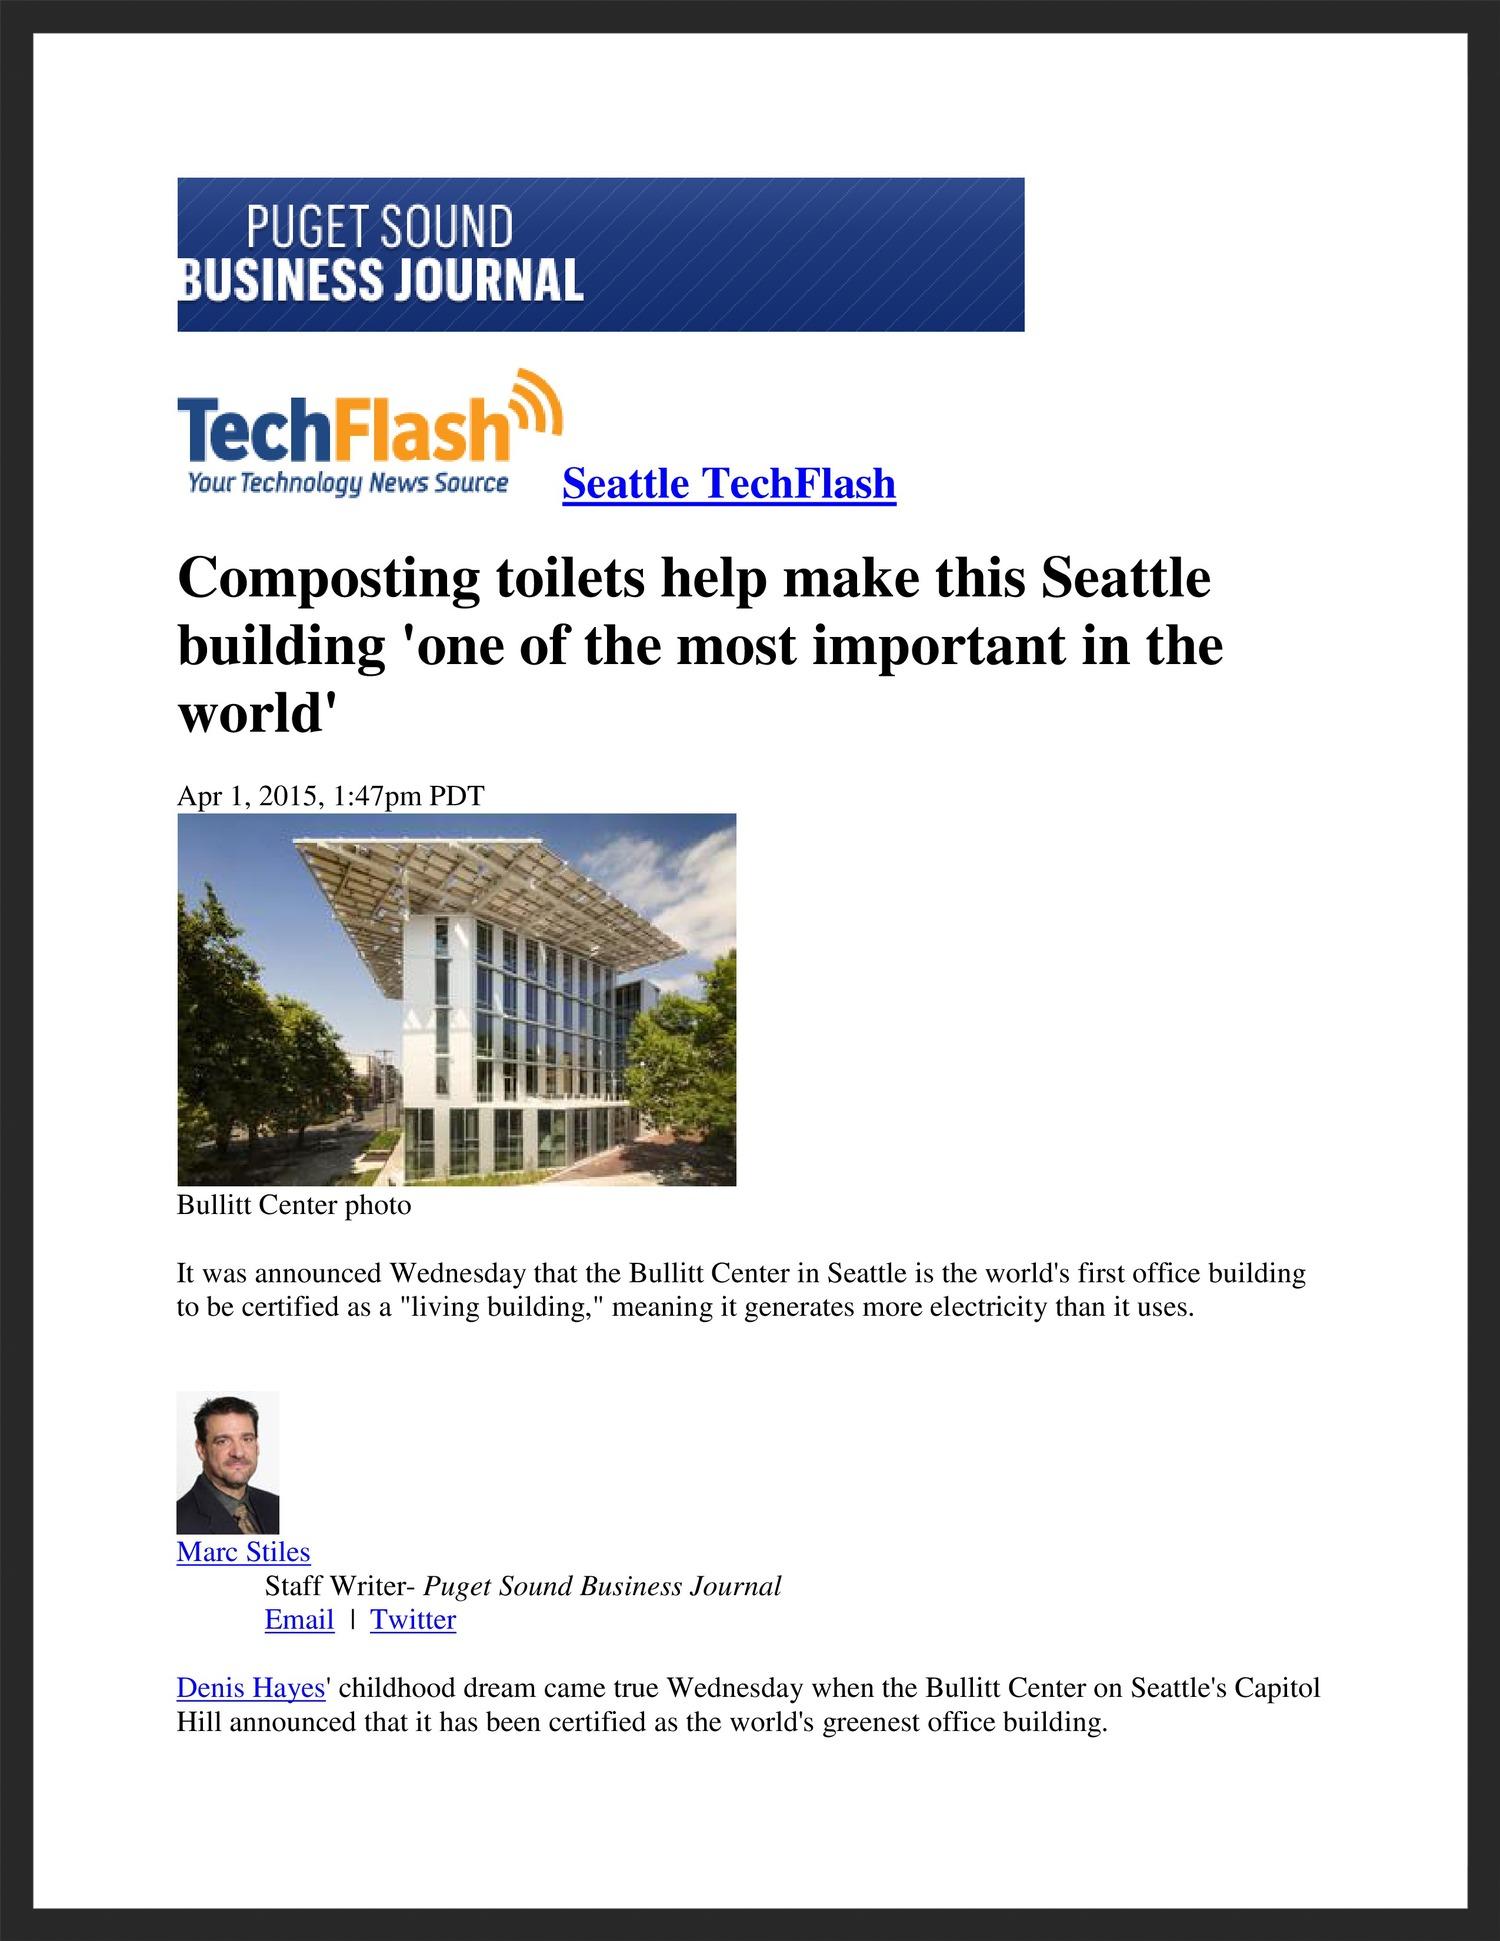 UNICO  Puget Sound Business Journal  04.01.2015